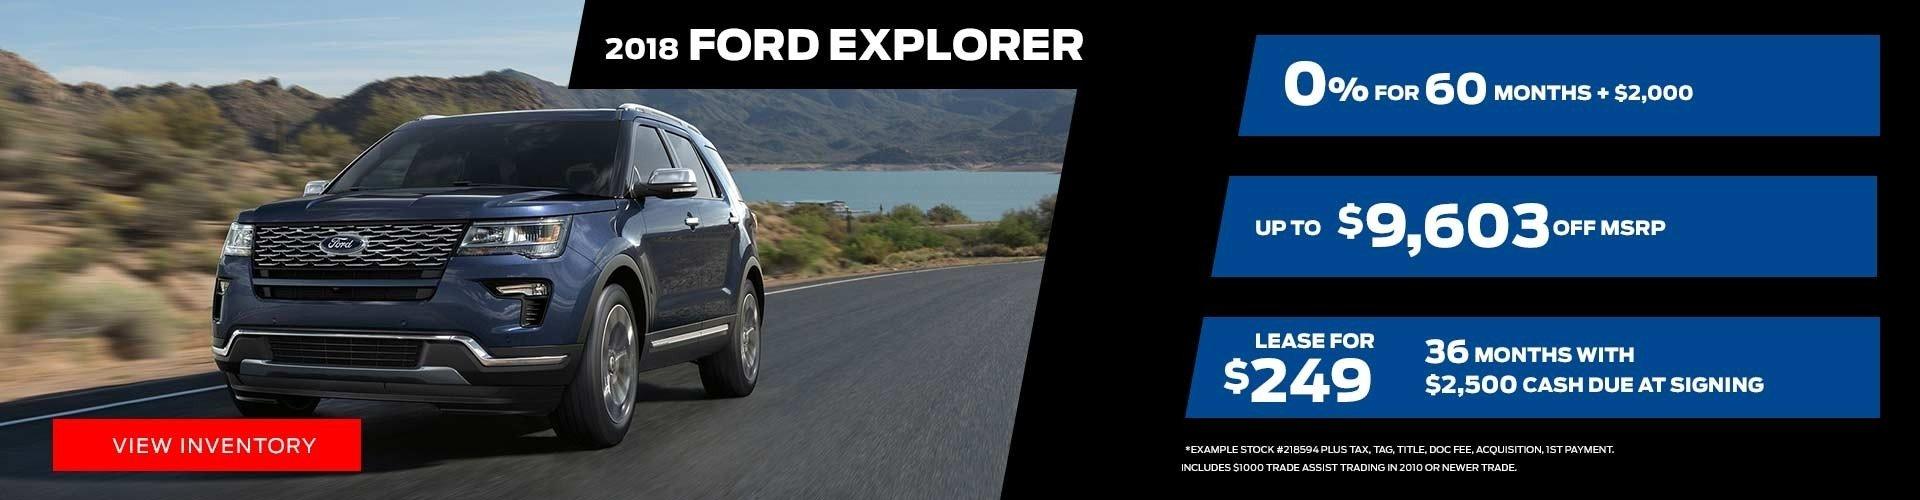 2018 Ford Explorer Special Offer